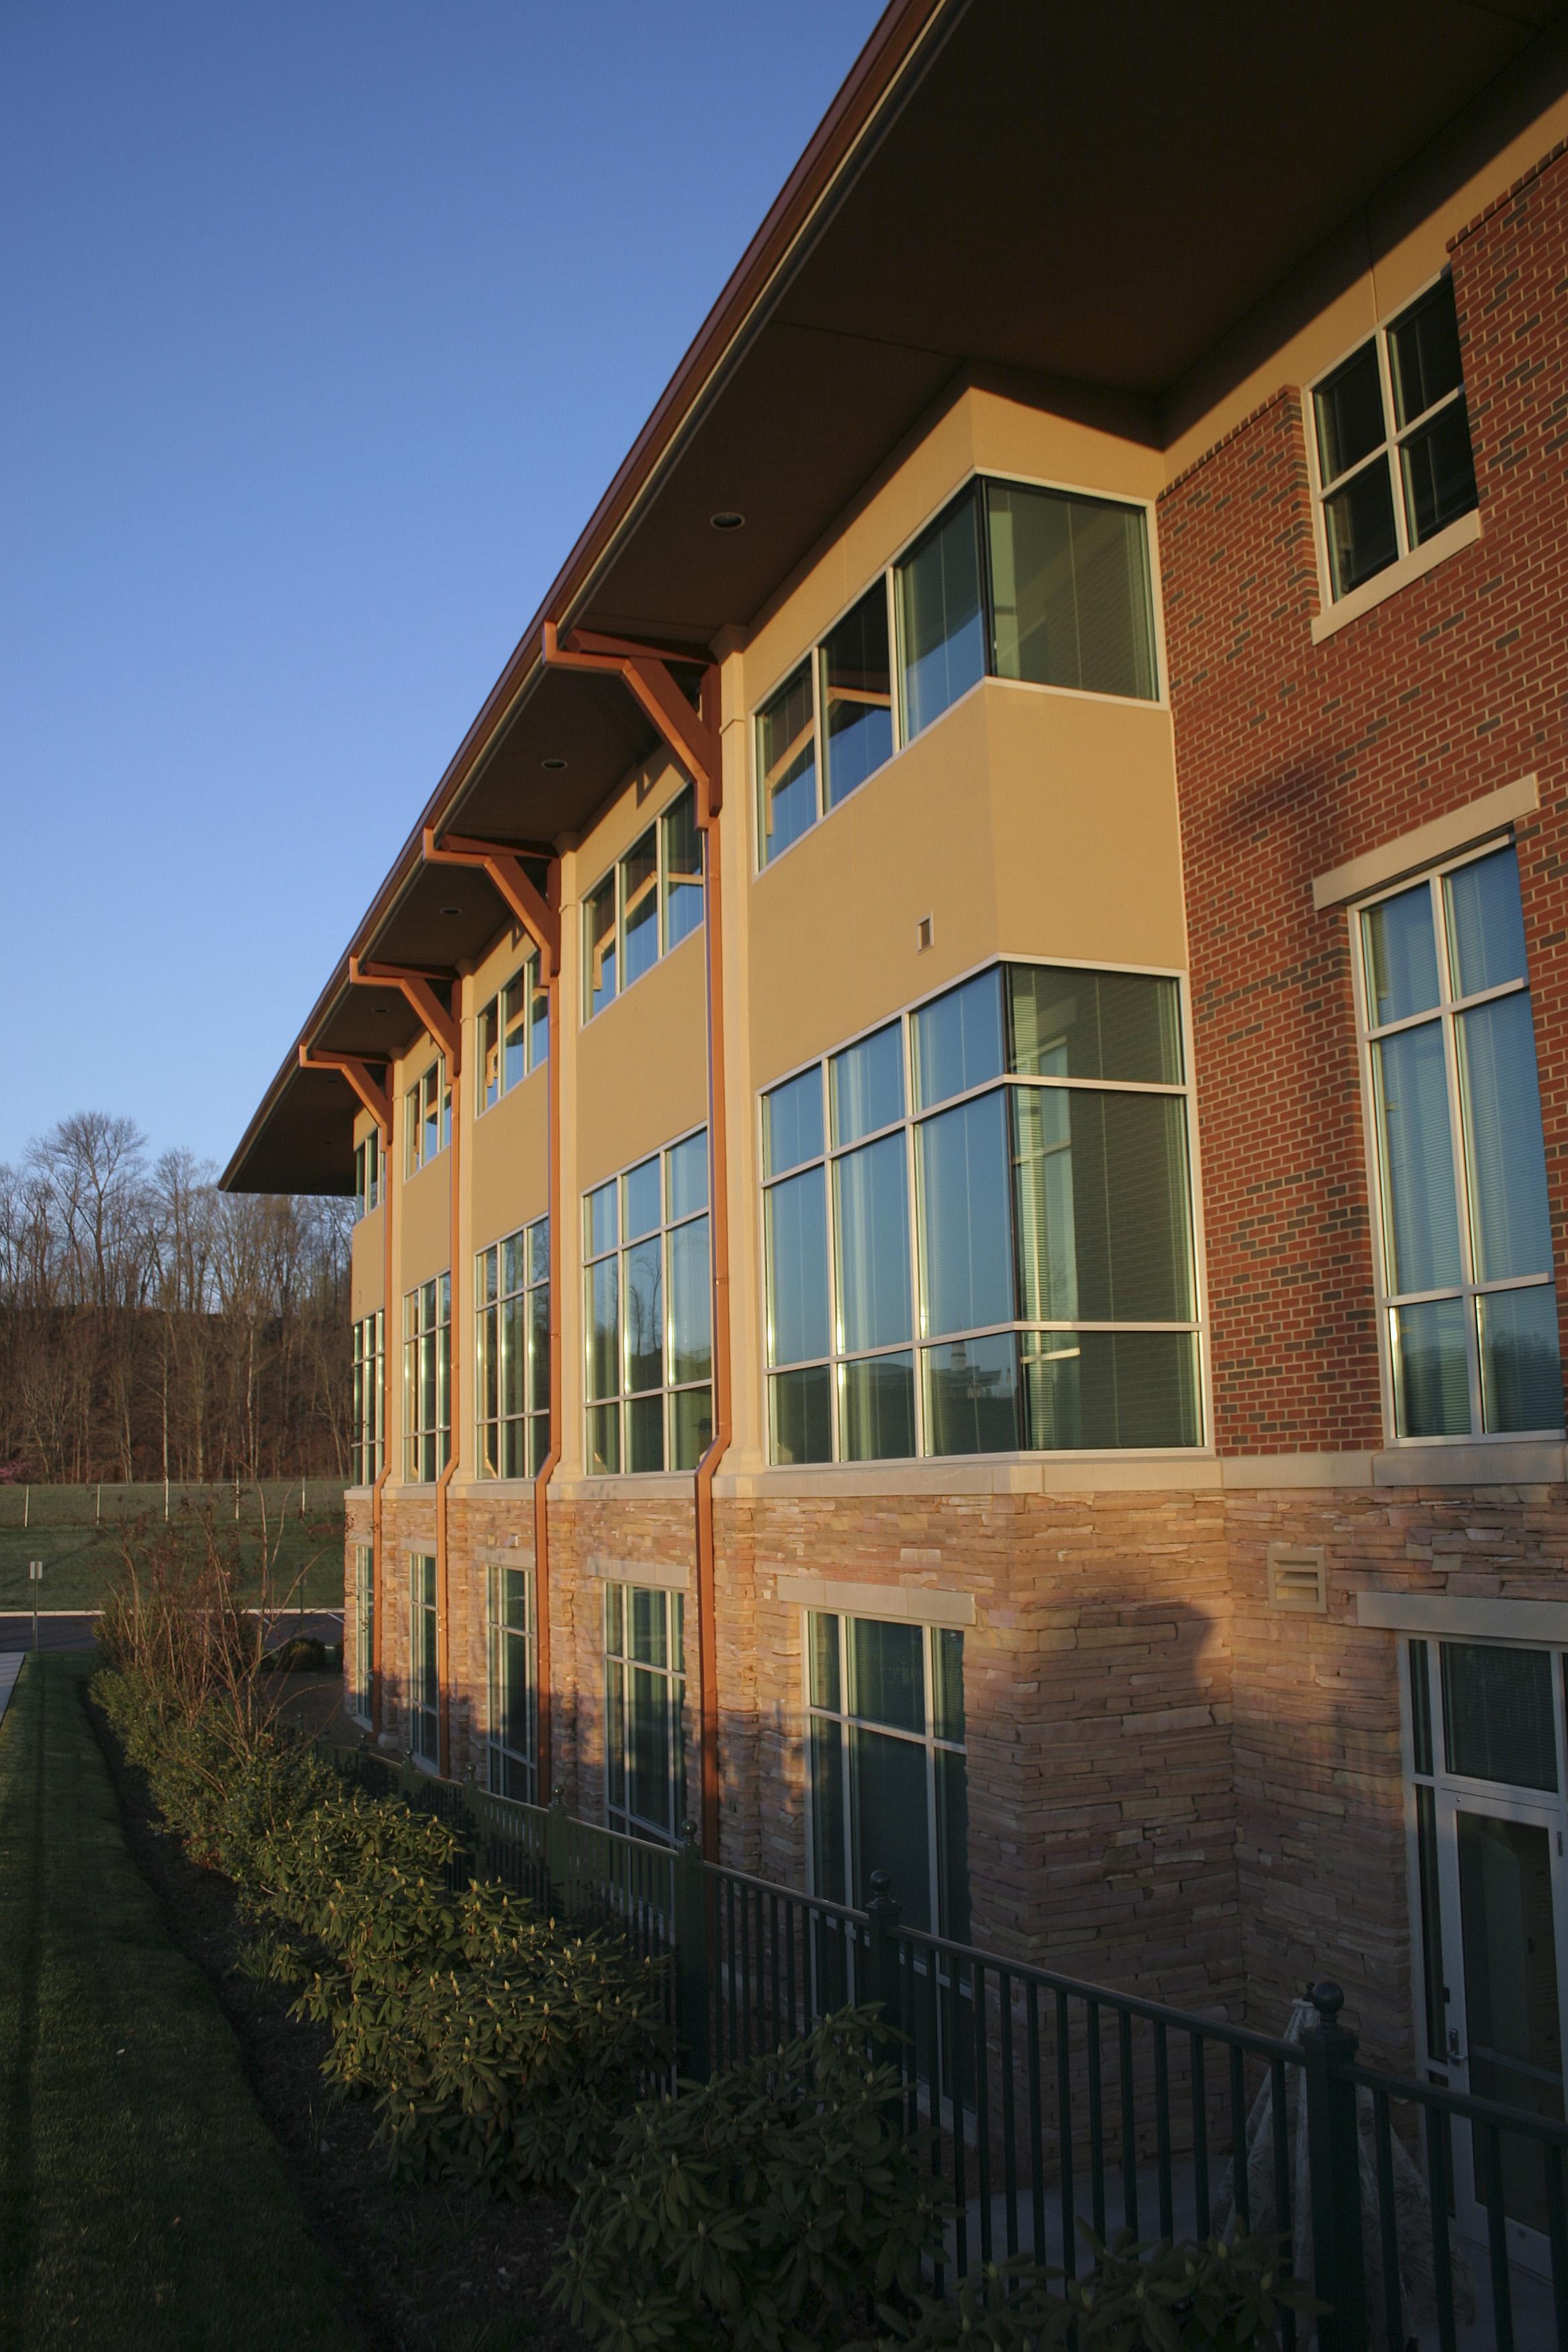 MEADOWVIEW LANE PROFESSIONAL CENTER